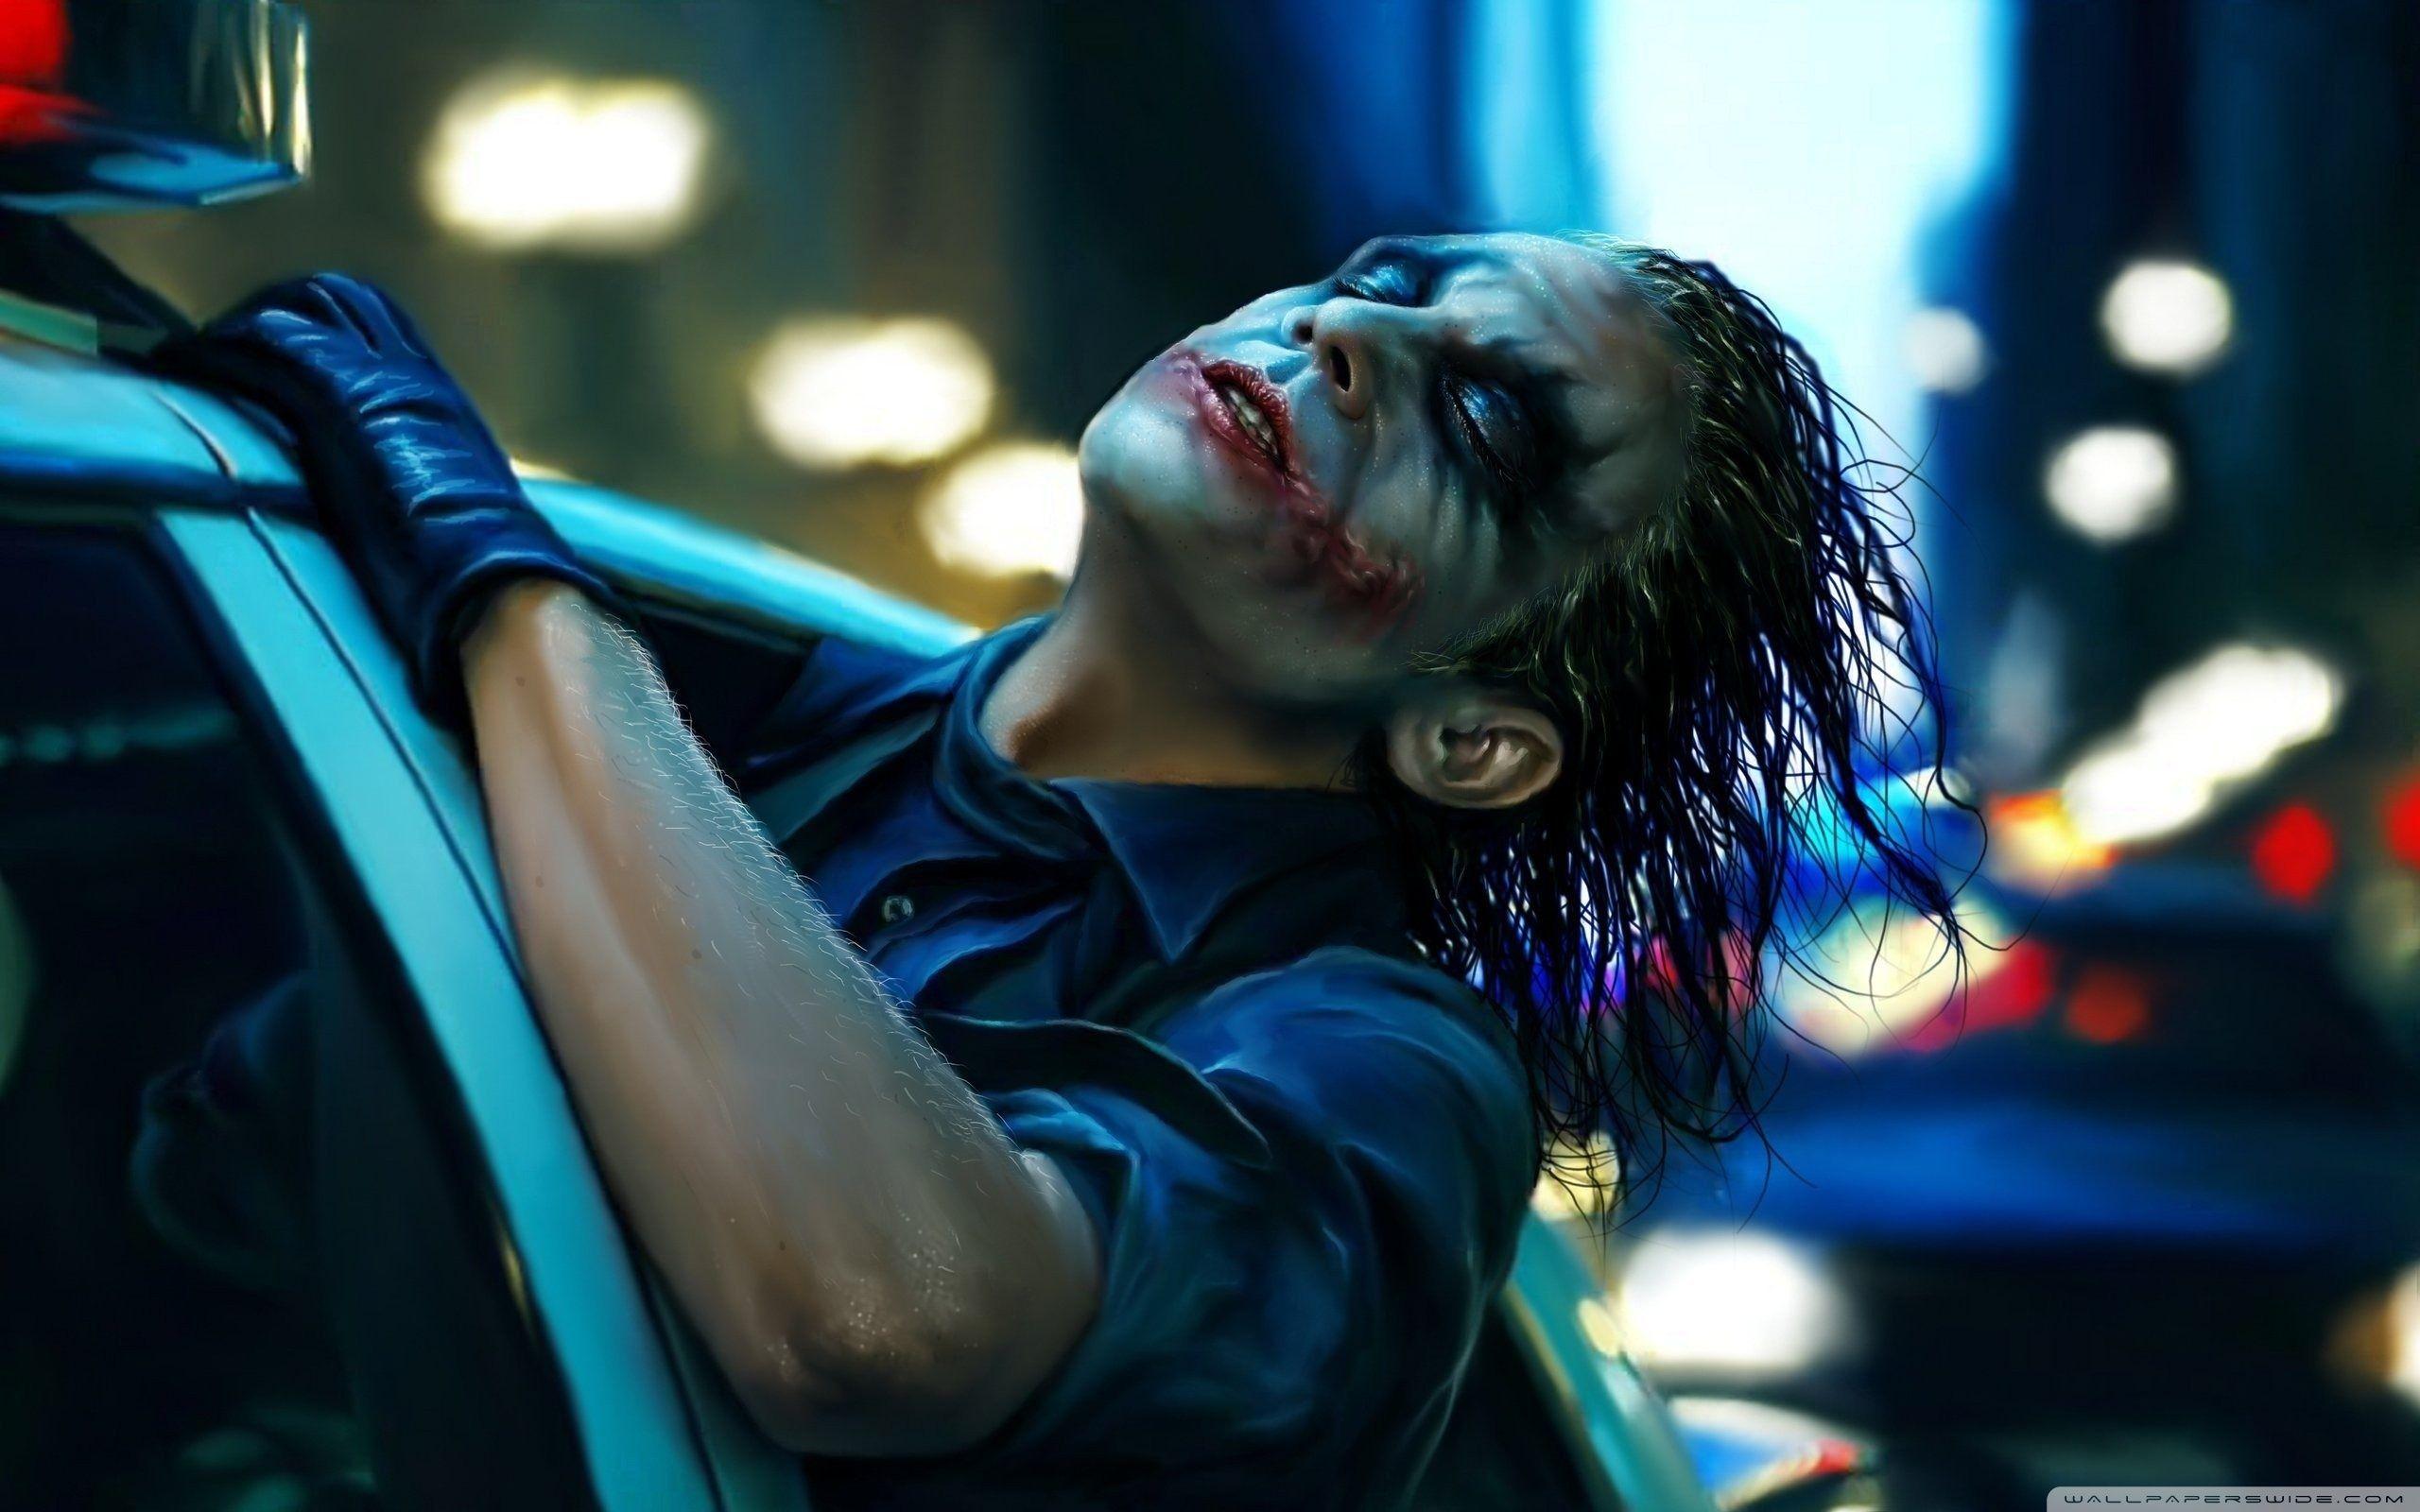 The Joker Painting Wallpaper Full Hd 2560x1600 Joker Hd